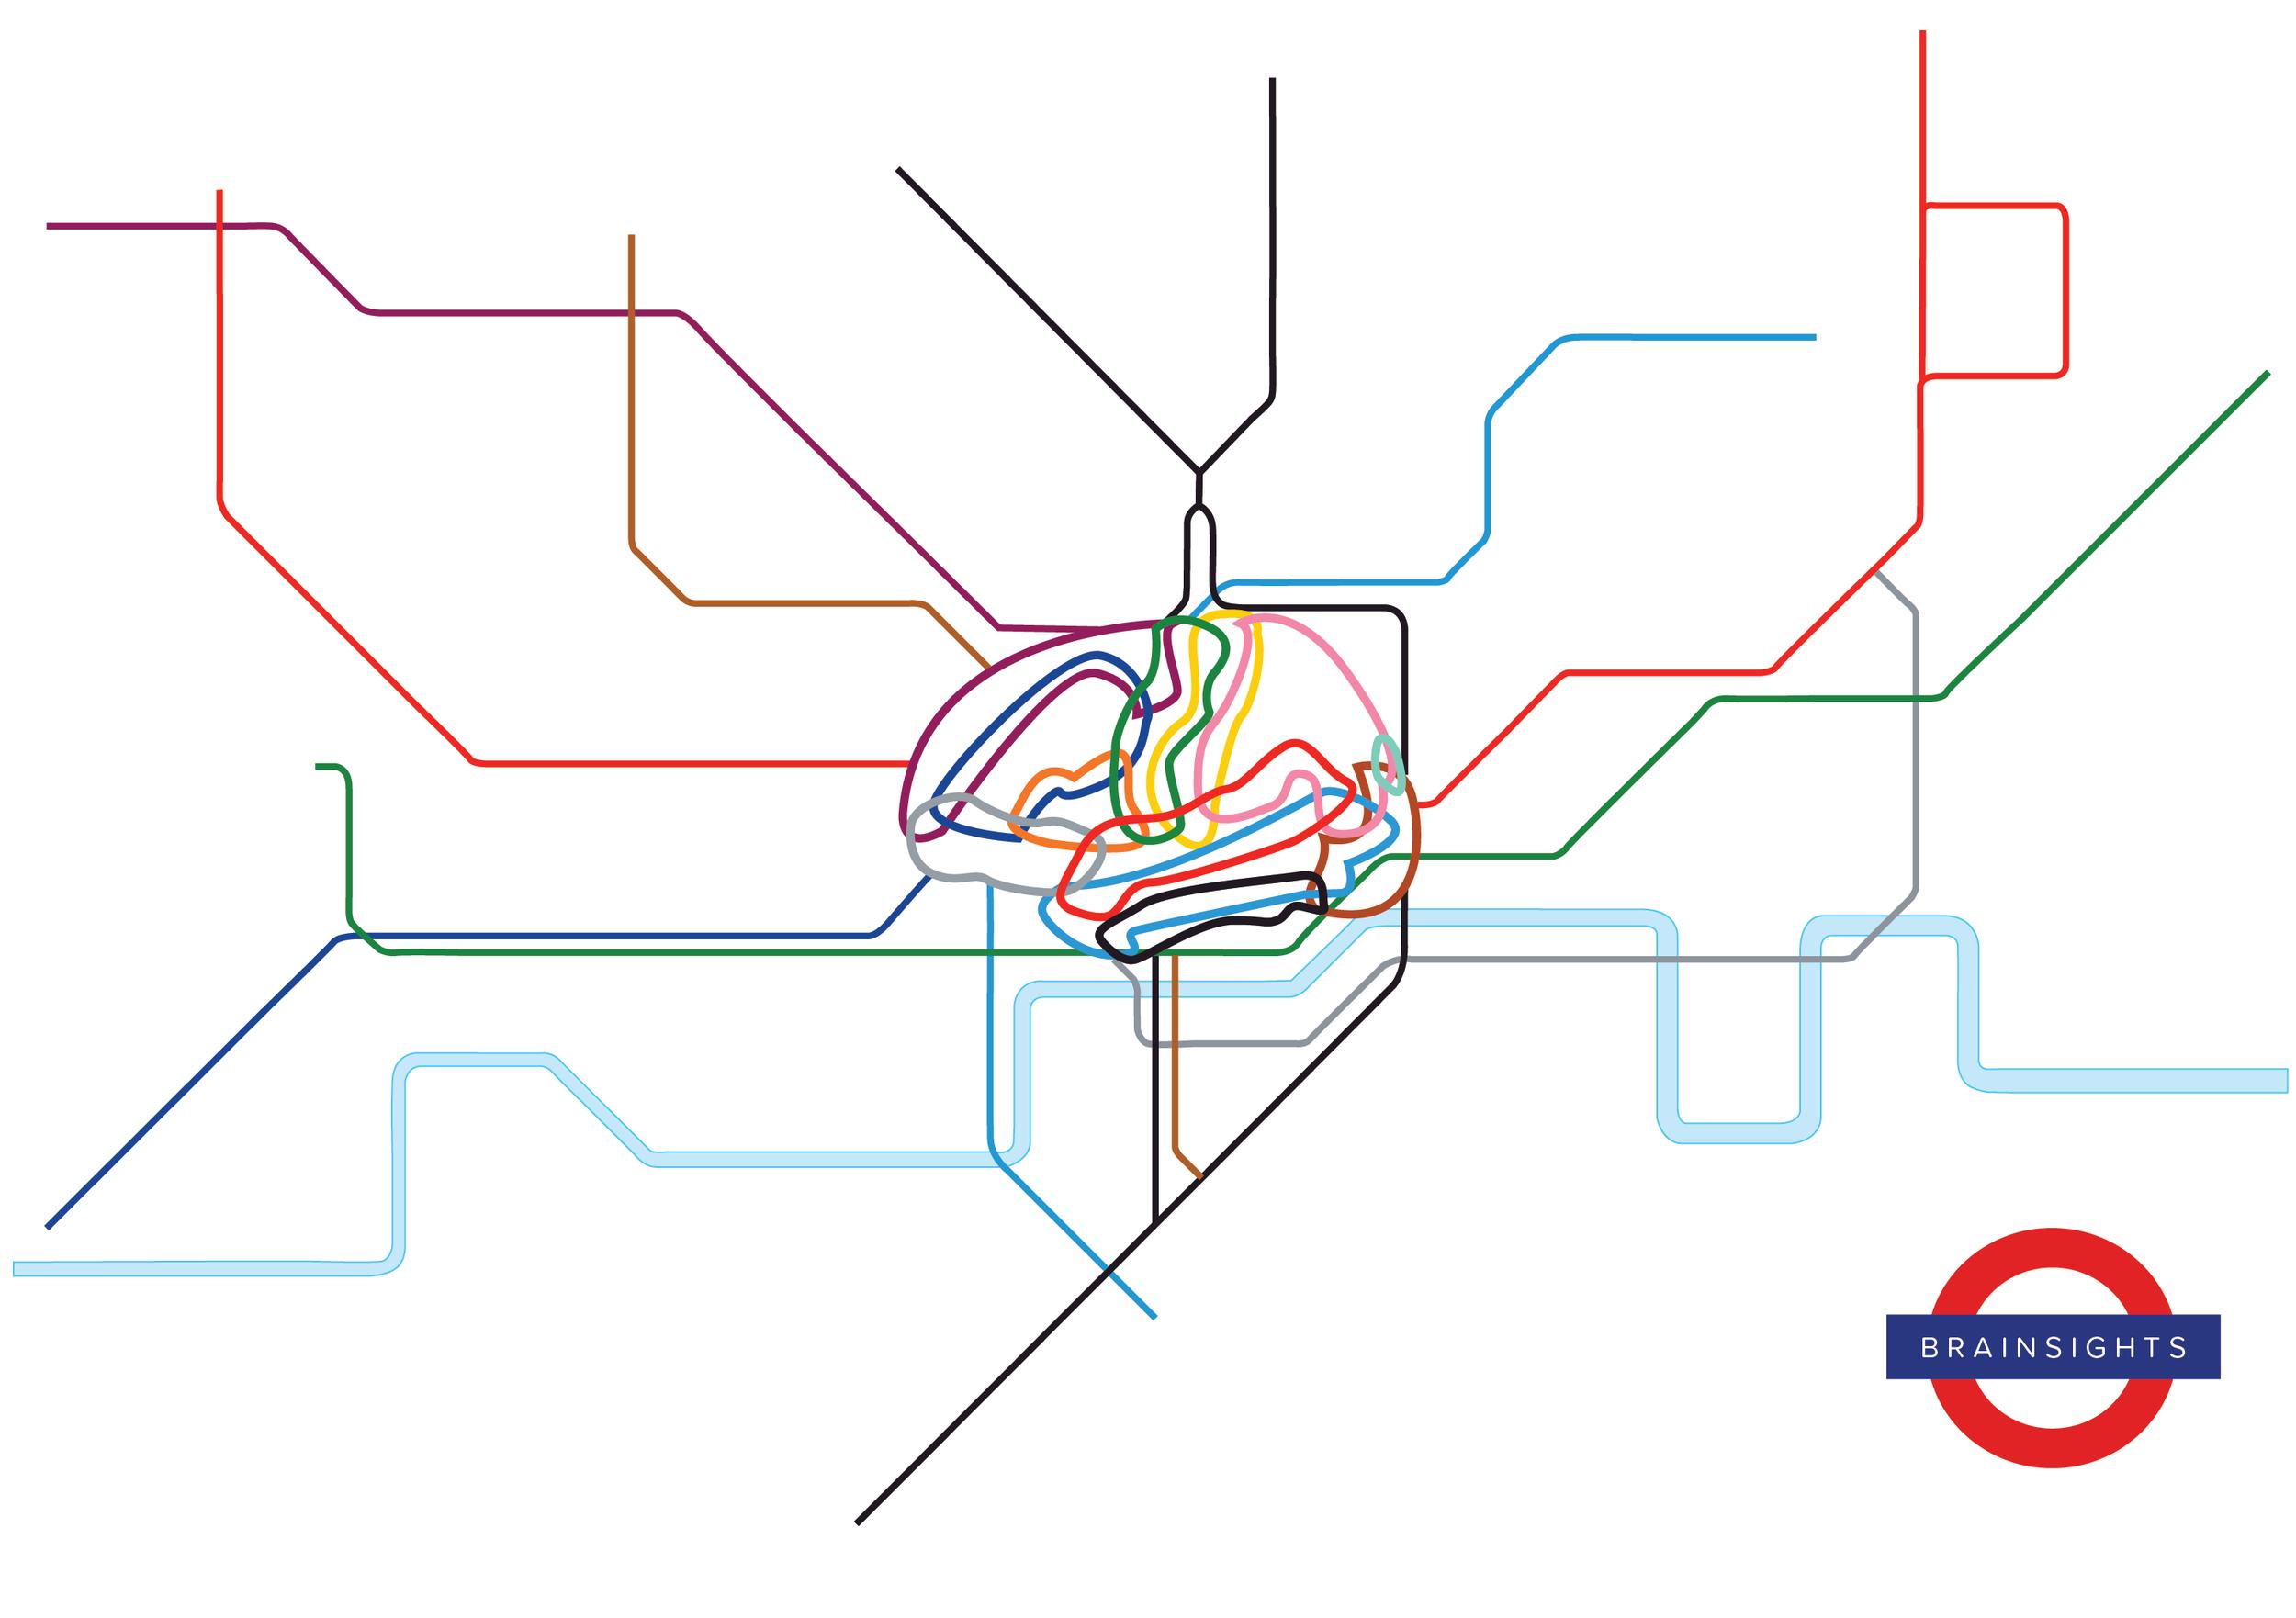 Brainsights London Tube Map, February 2017